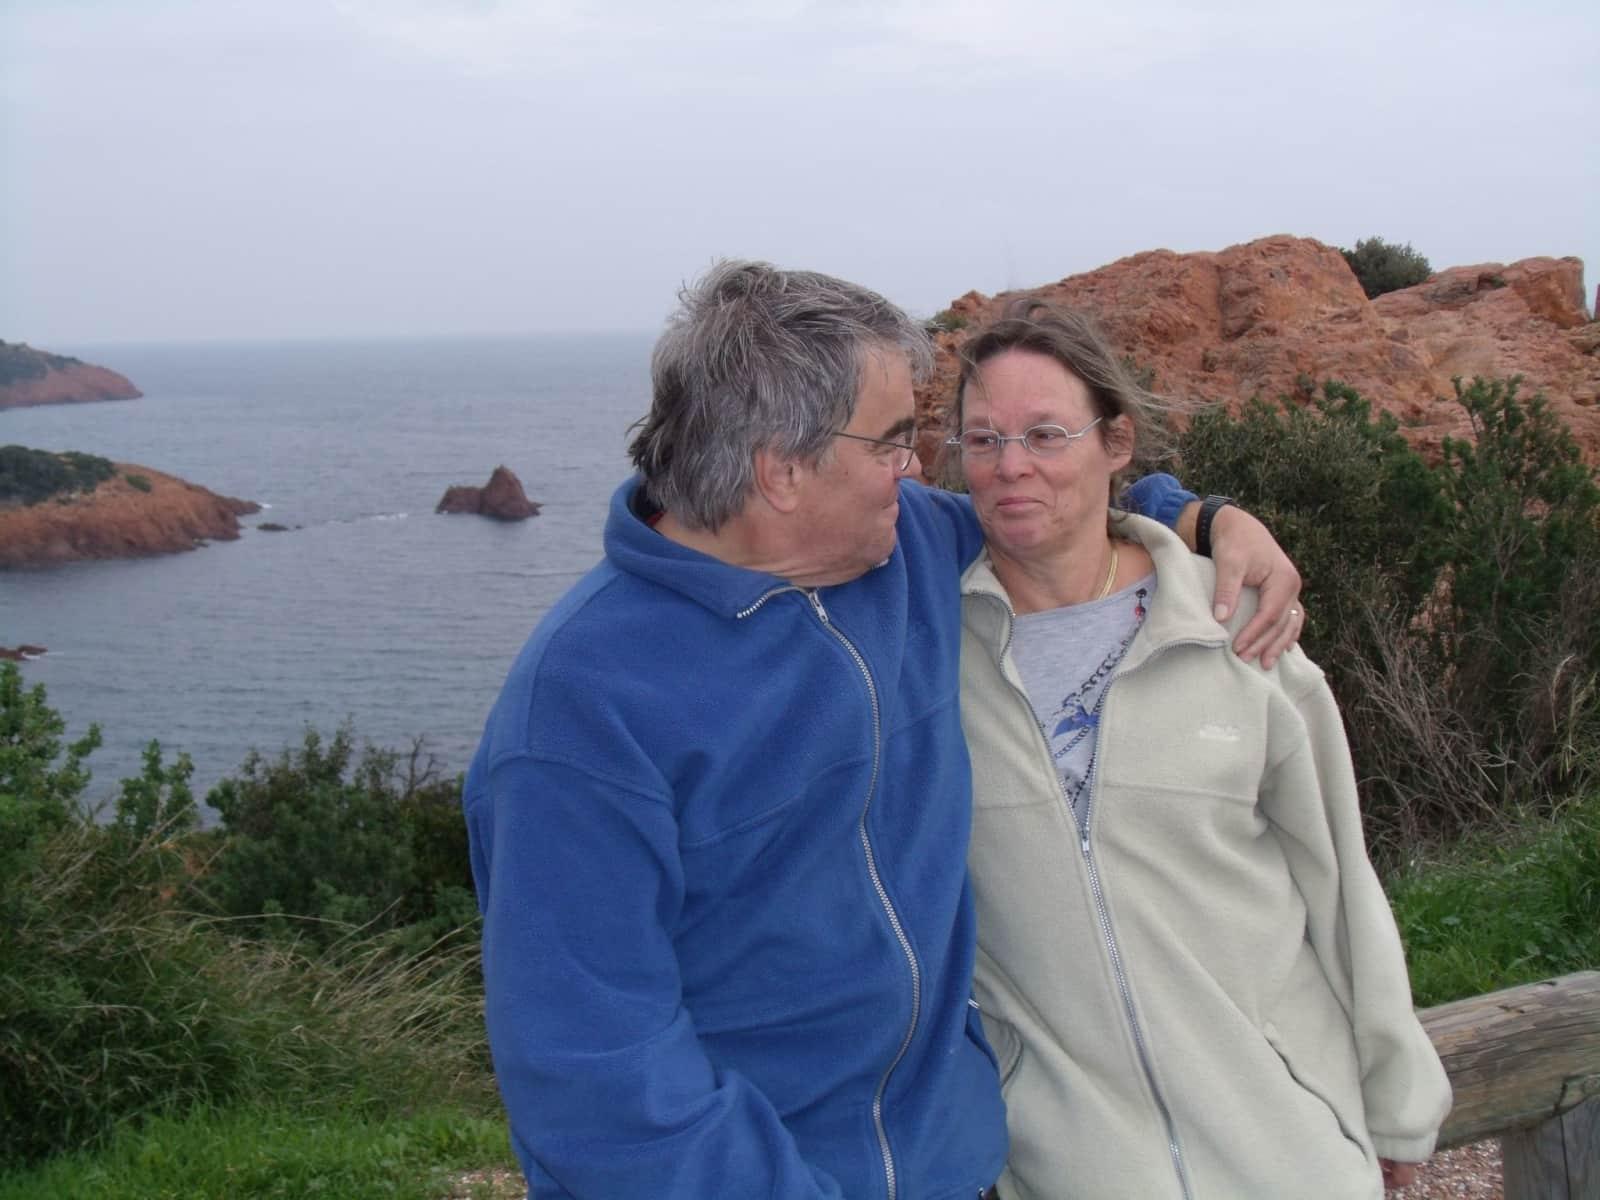 Urbain & Annette from Maassluis, Netherlands